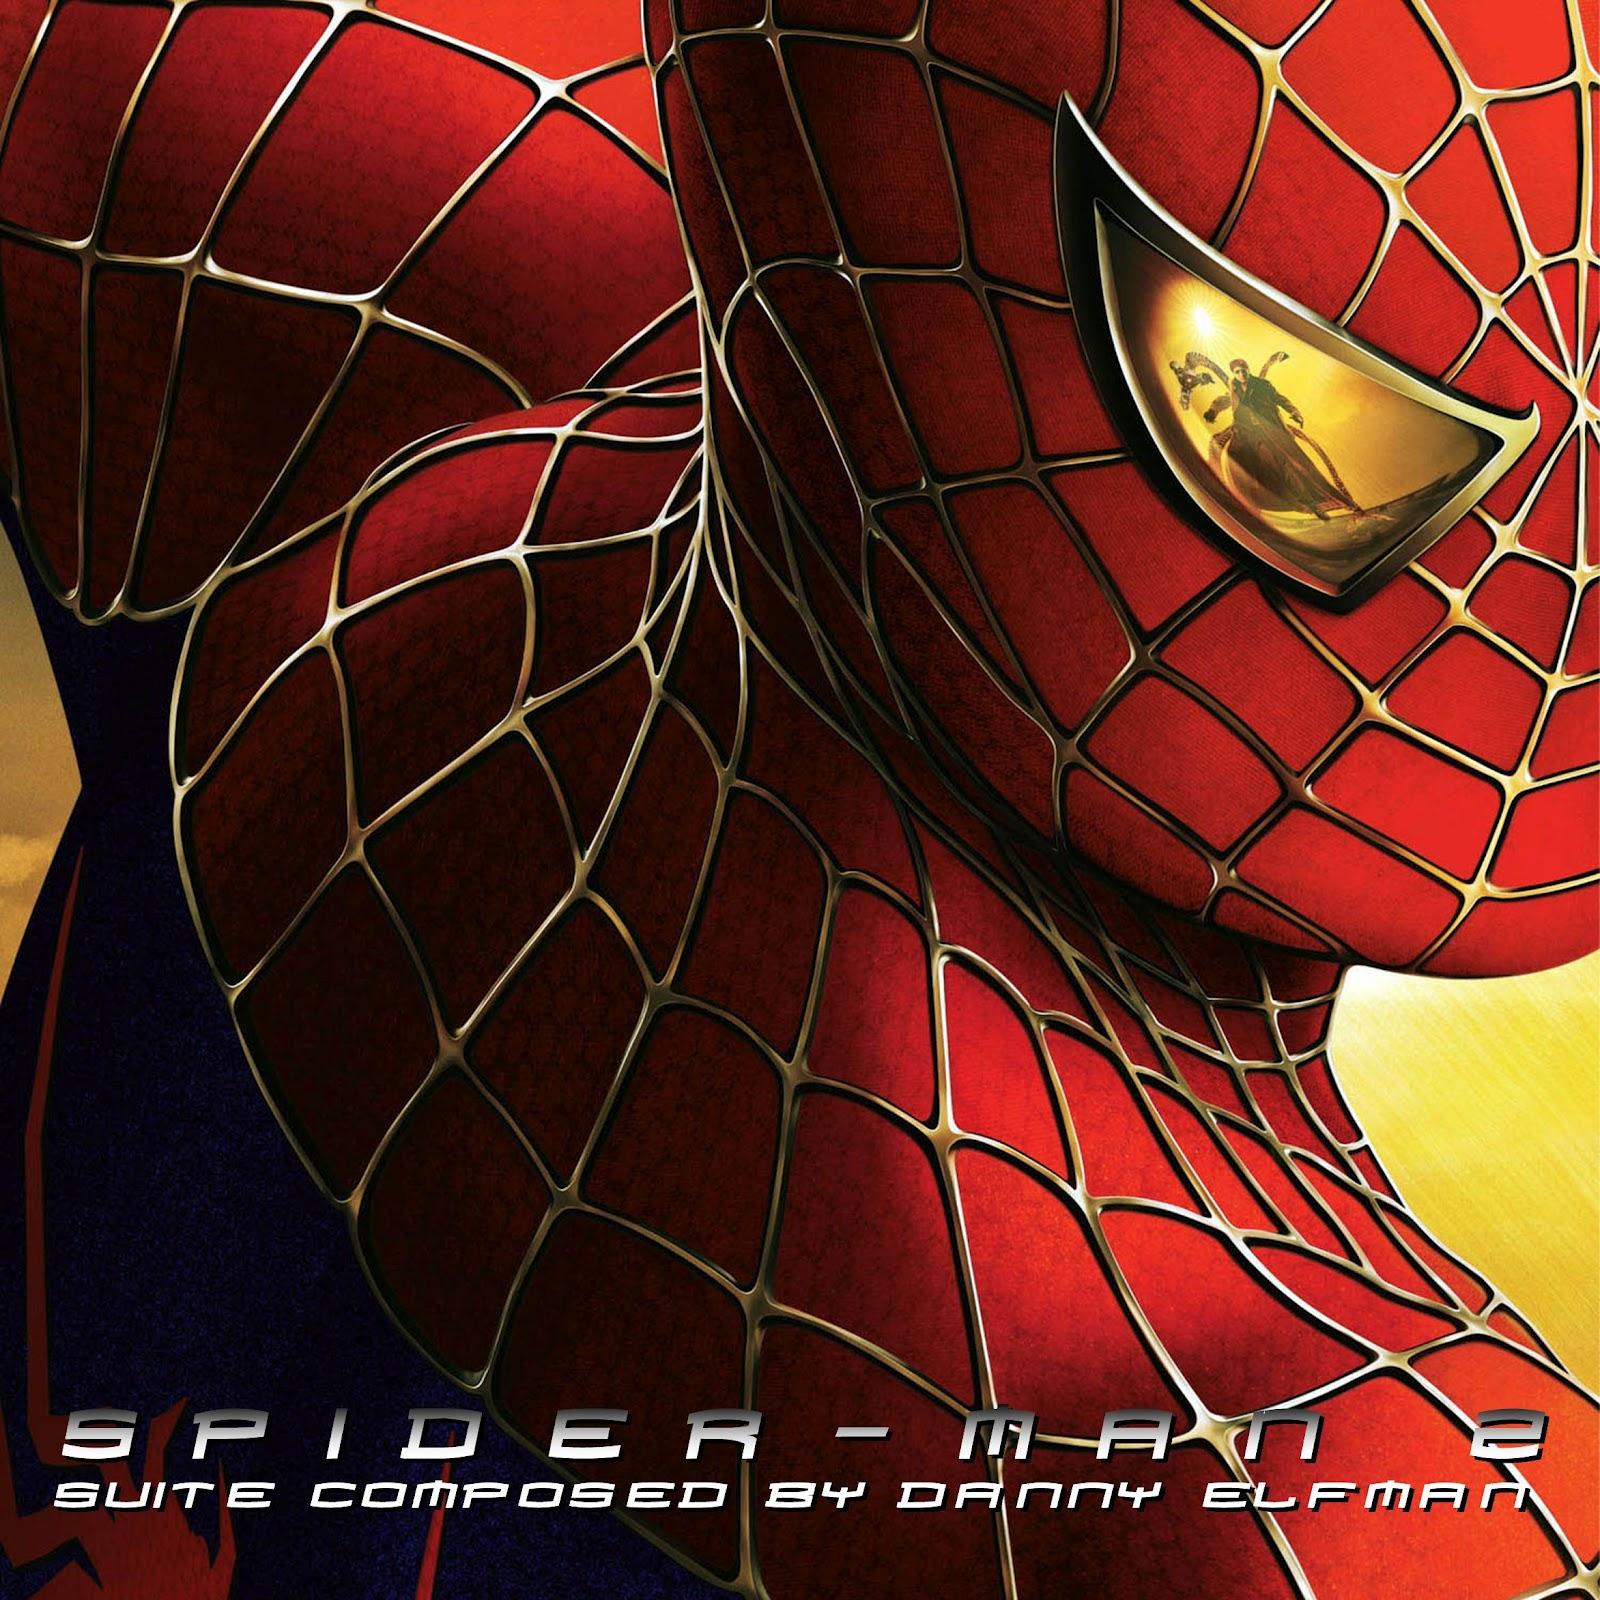 http://4.bp.blogspot.com/-biDkf2bDjKM/UBVaC9mmECI/AAAAAAAADtE/vIgXMa5jNzw/s1600/Spider-Man+2.jpg